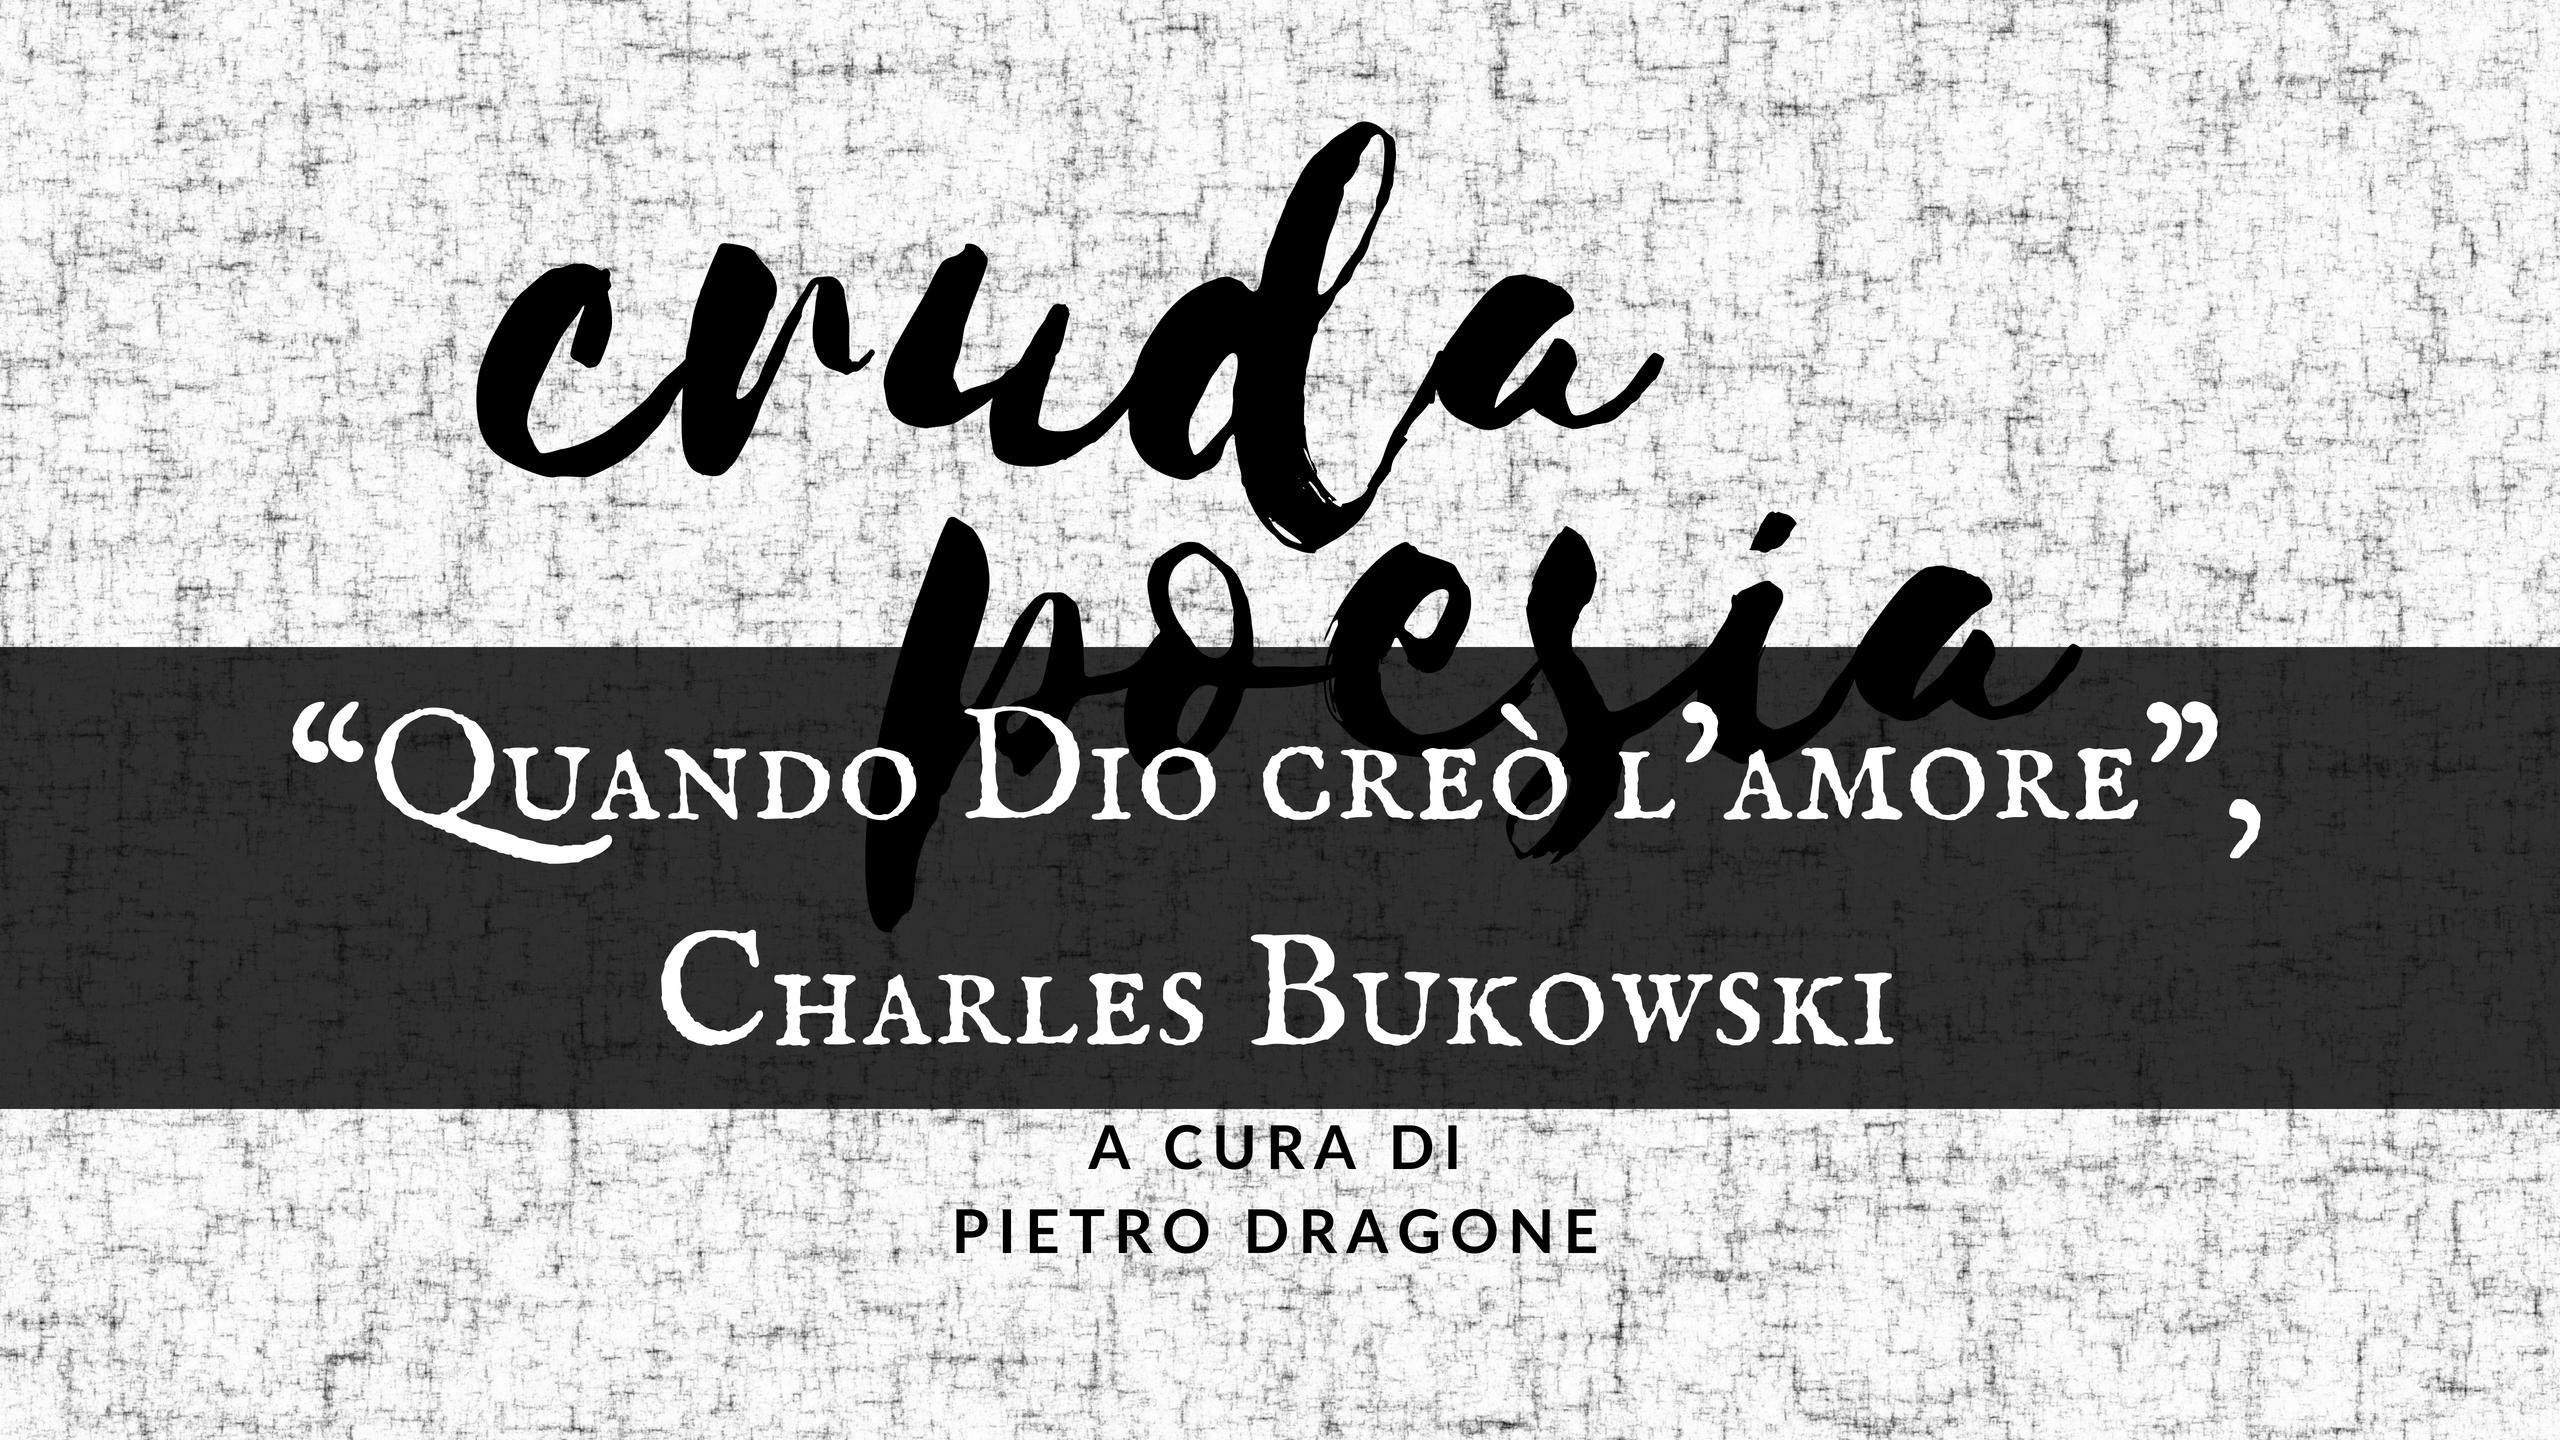 """Quando Dio creò l'amore"", di Charles Bukowski"